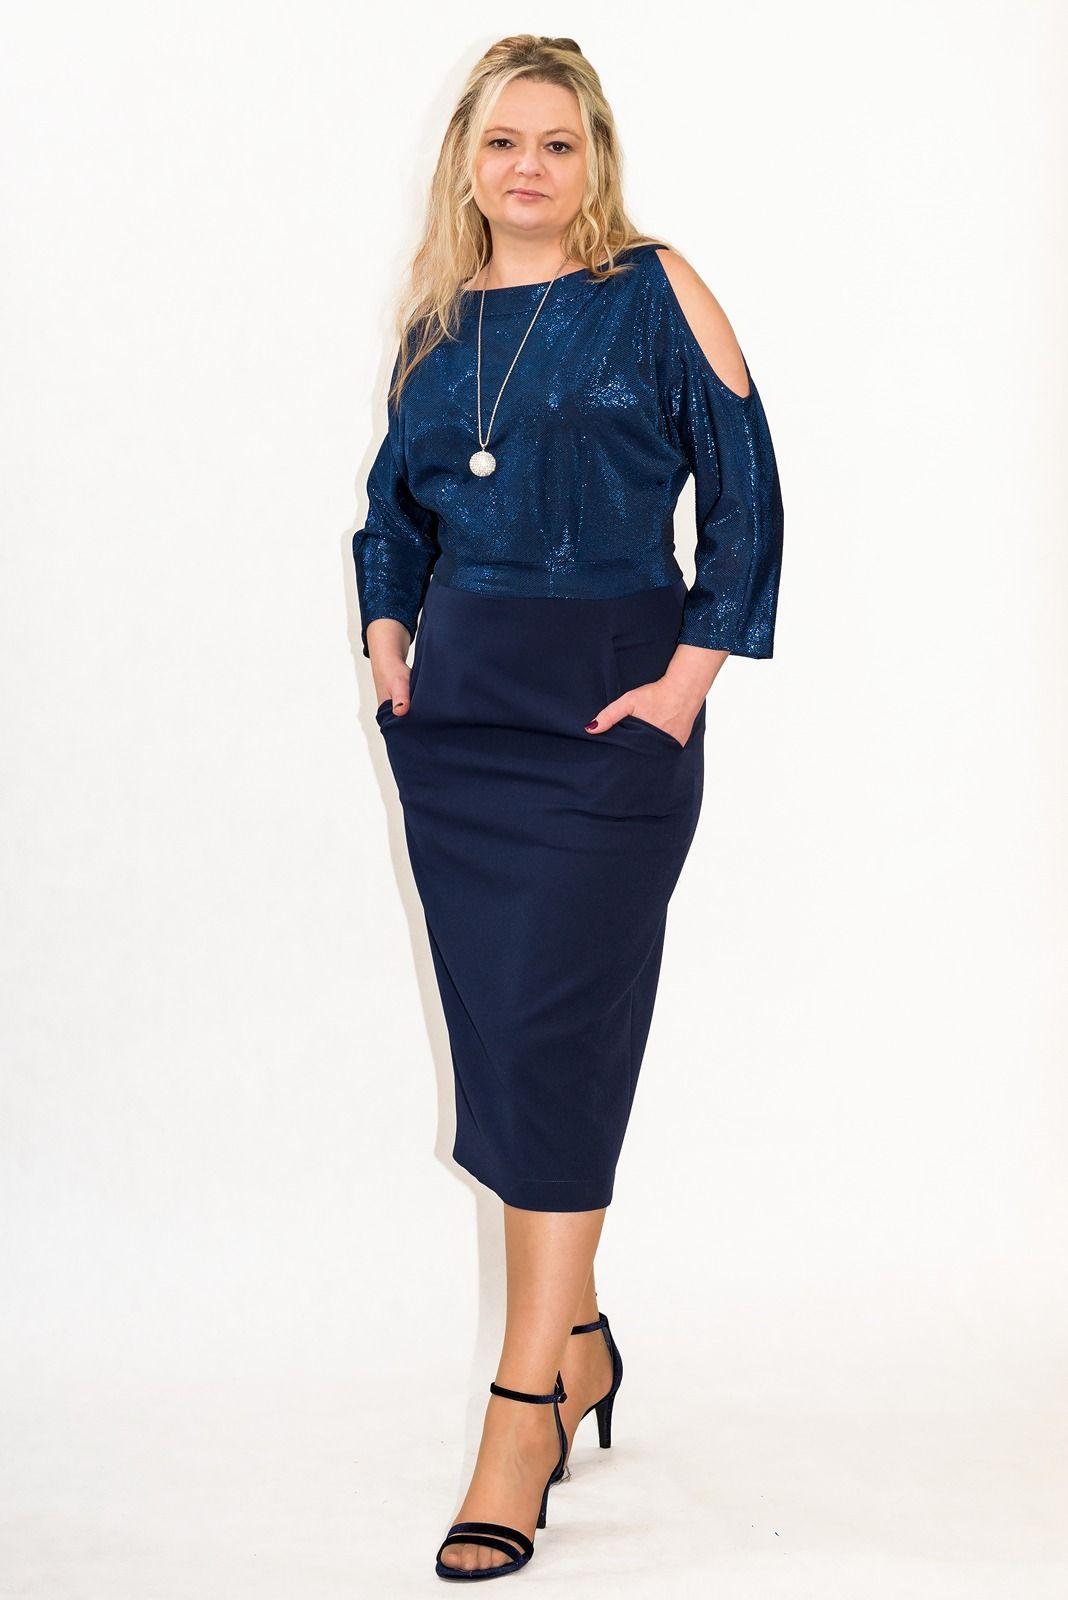 c5cc8589e95915 Elegancka sukienka XXL MARI 40-60 PLUS SIZE #eleganckie #sukienki #sukienka  #